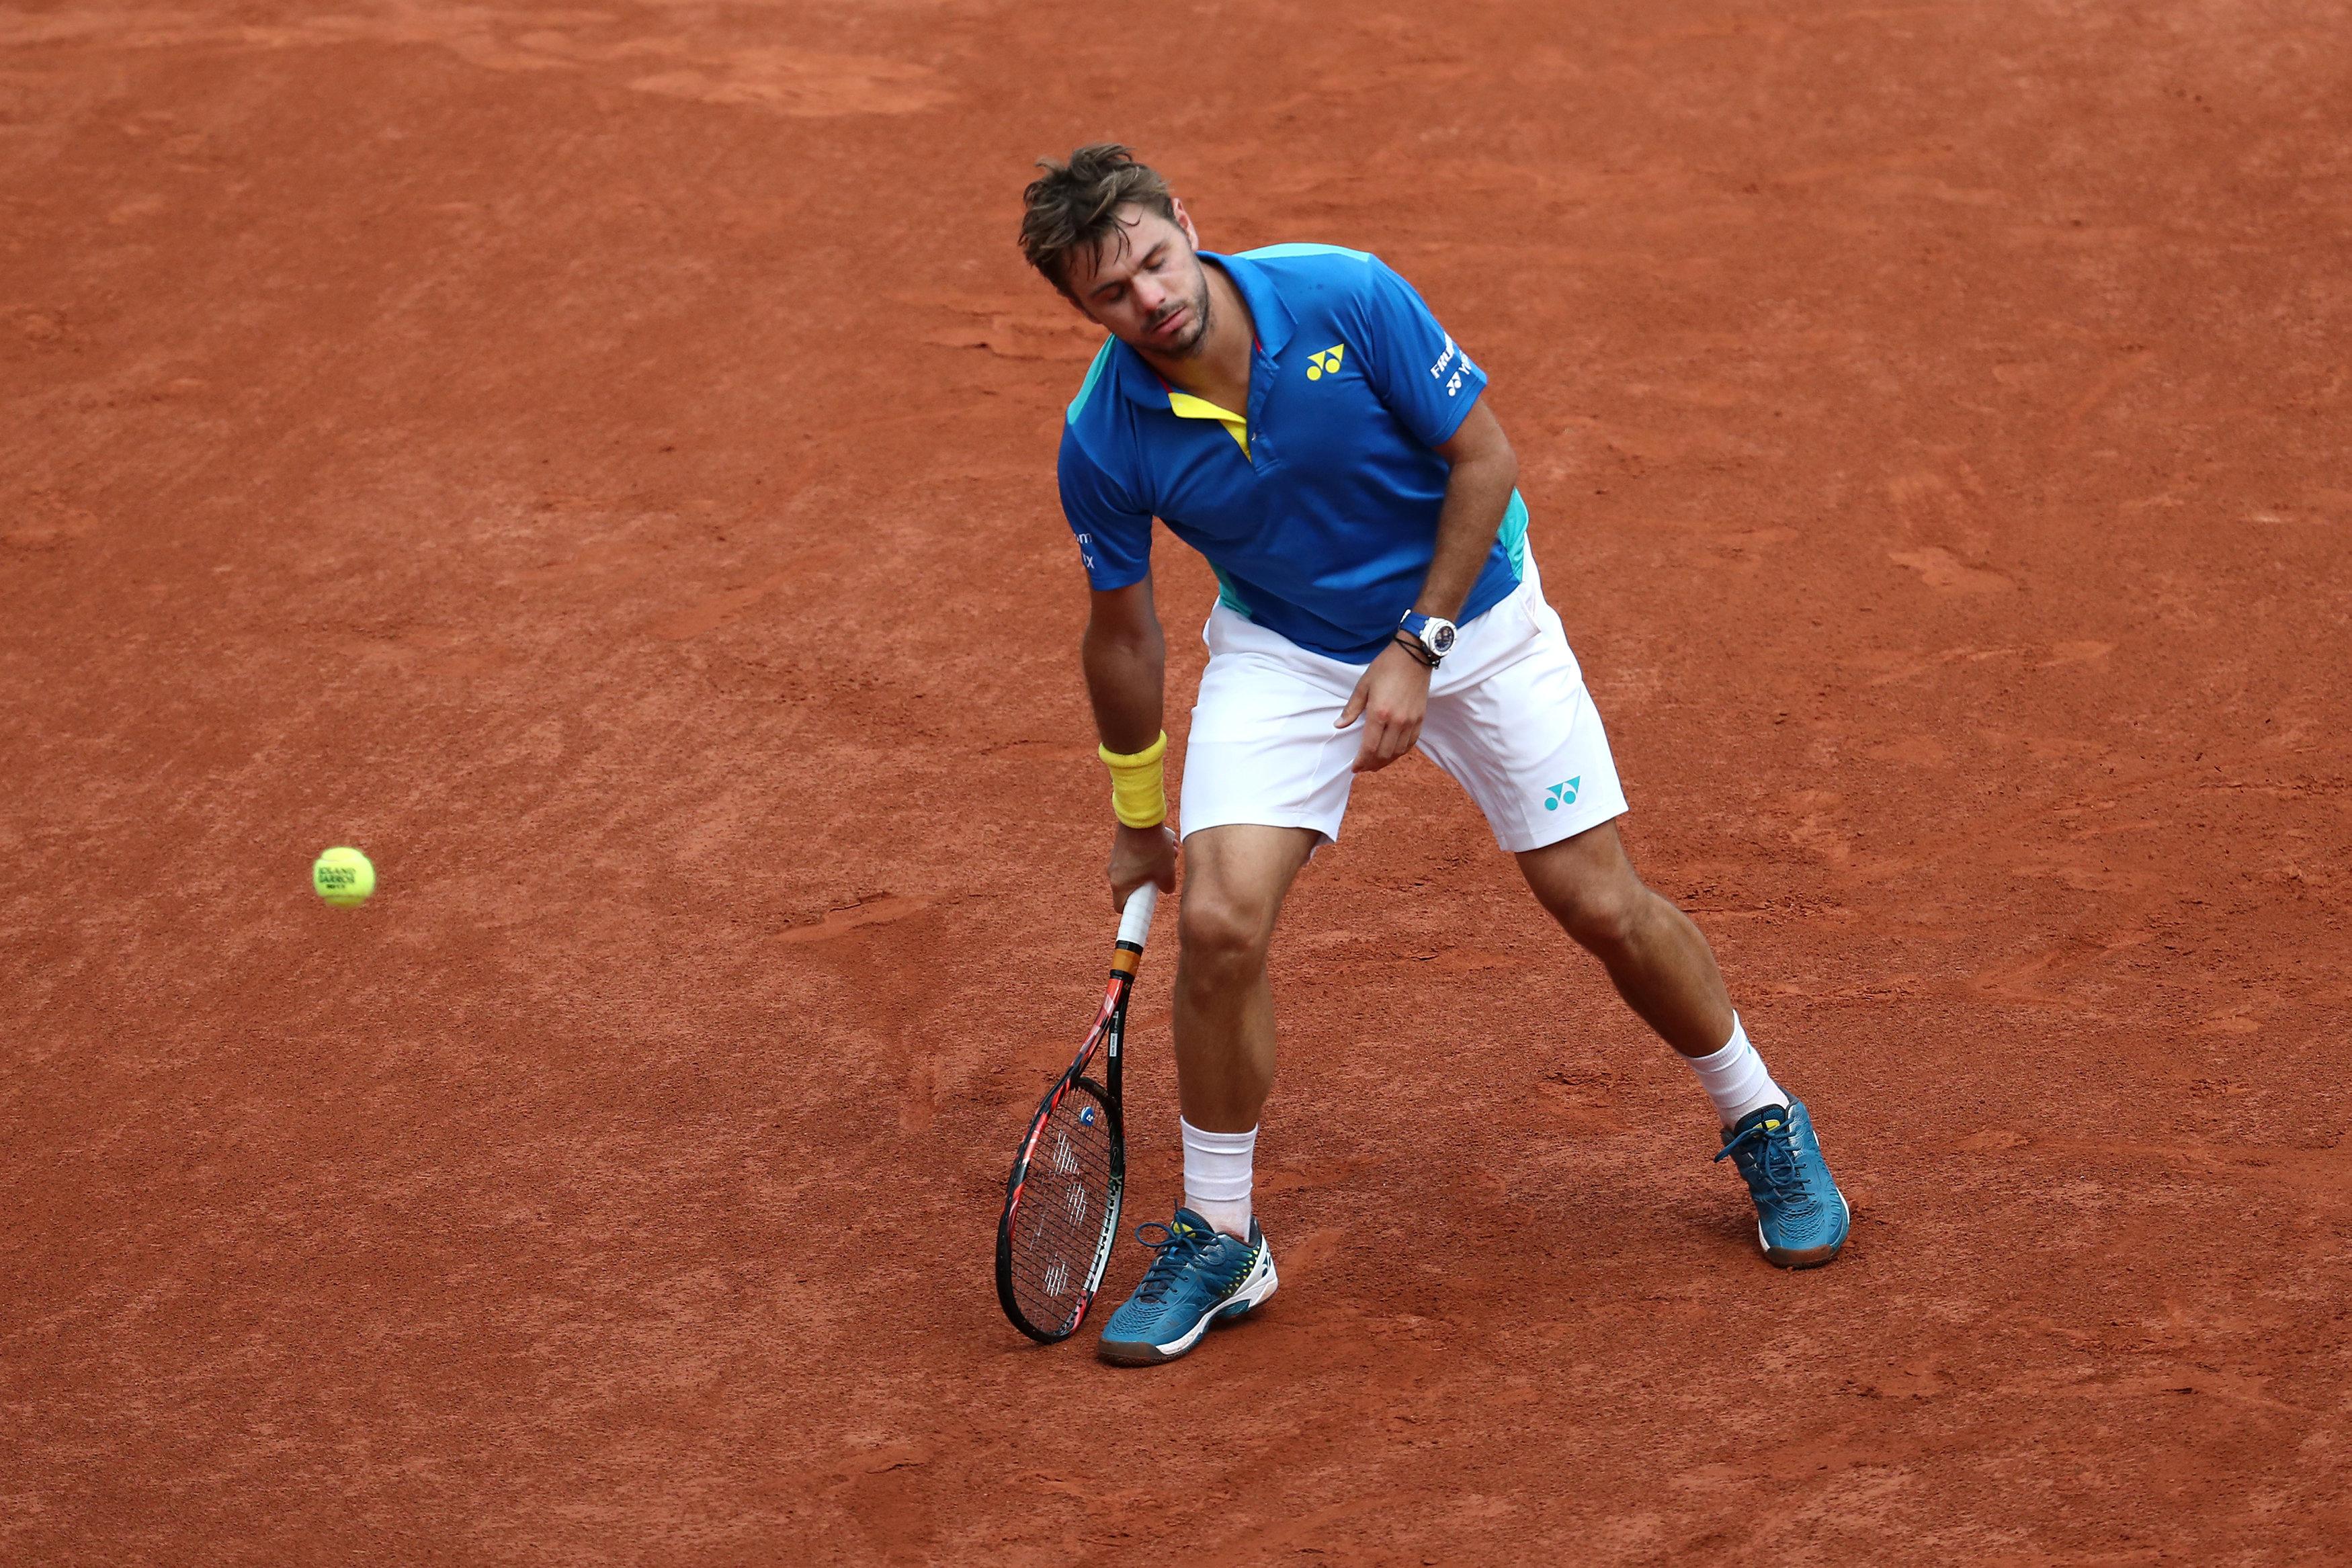 Switzerland's Stan Wawrinka looks dejected during the final against Spain's Rafael Nadal in Paris, France on June 11, 2017 (Reuters/Pascal Rossignol)